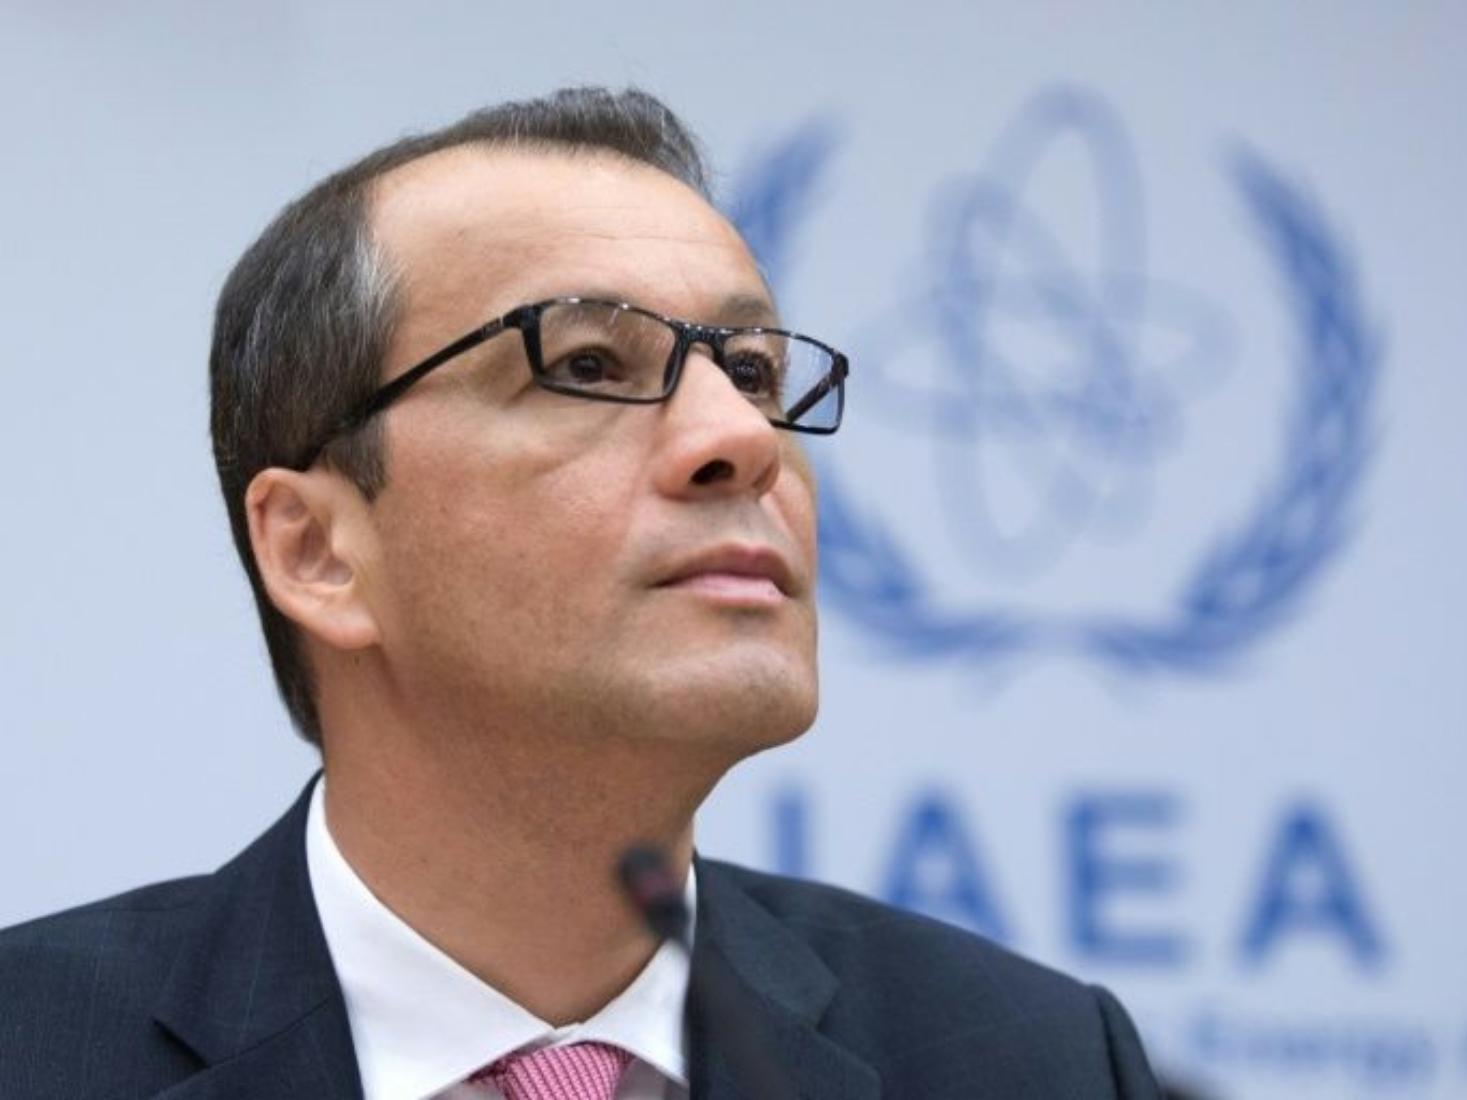 Atomic watchdog chief in Iran for high-level talks